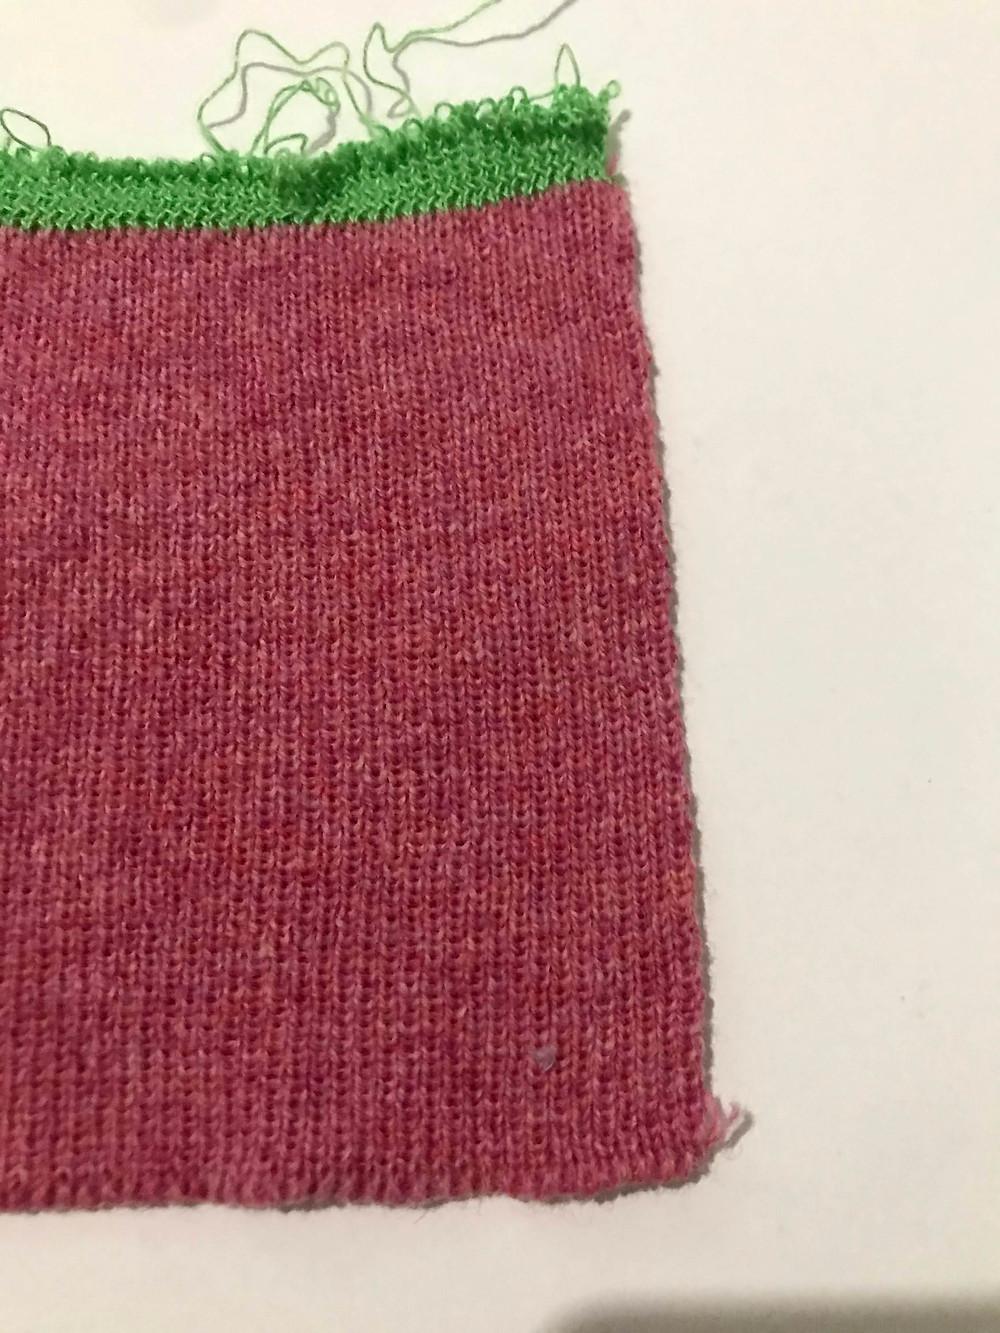 Lambswool, Pink, plain knit on 7 gauge.